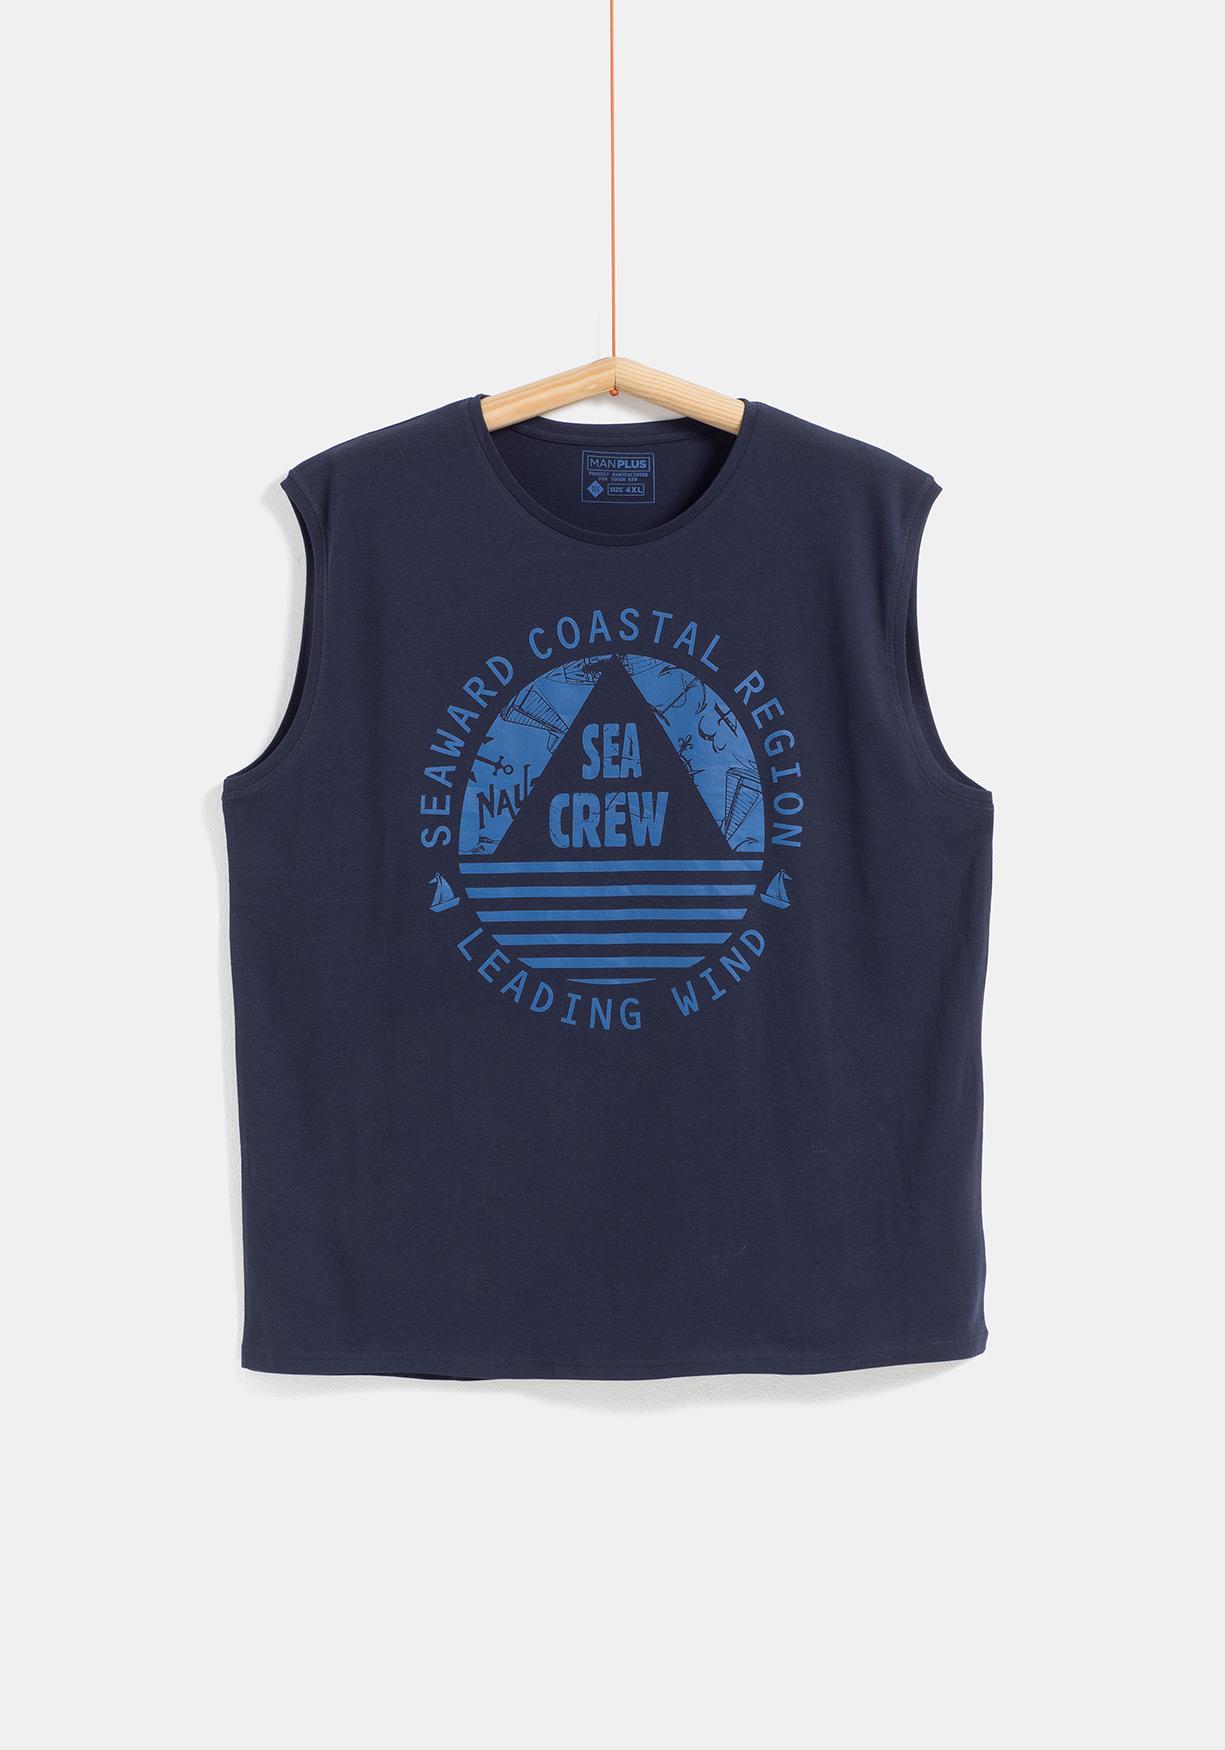 a9f9193ec1b Comprar Camiseta sin mangas para Tallas Grandes TEX. ¡Aprovéchate de ...